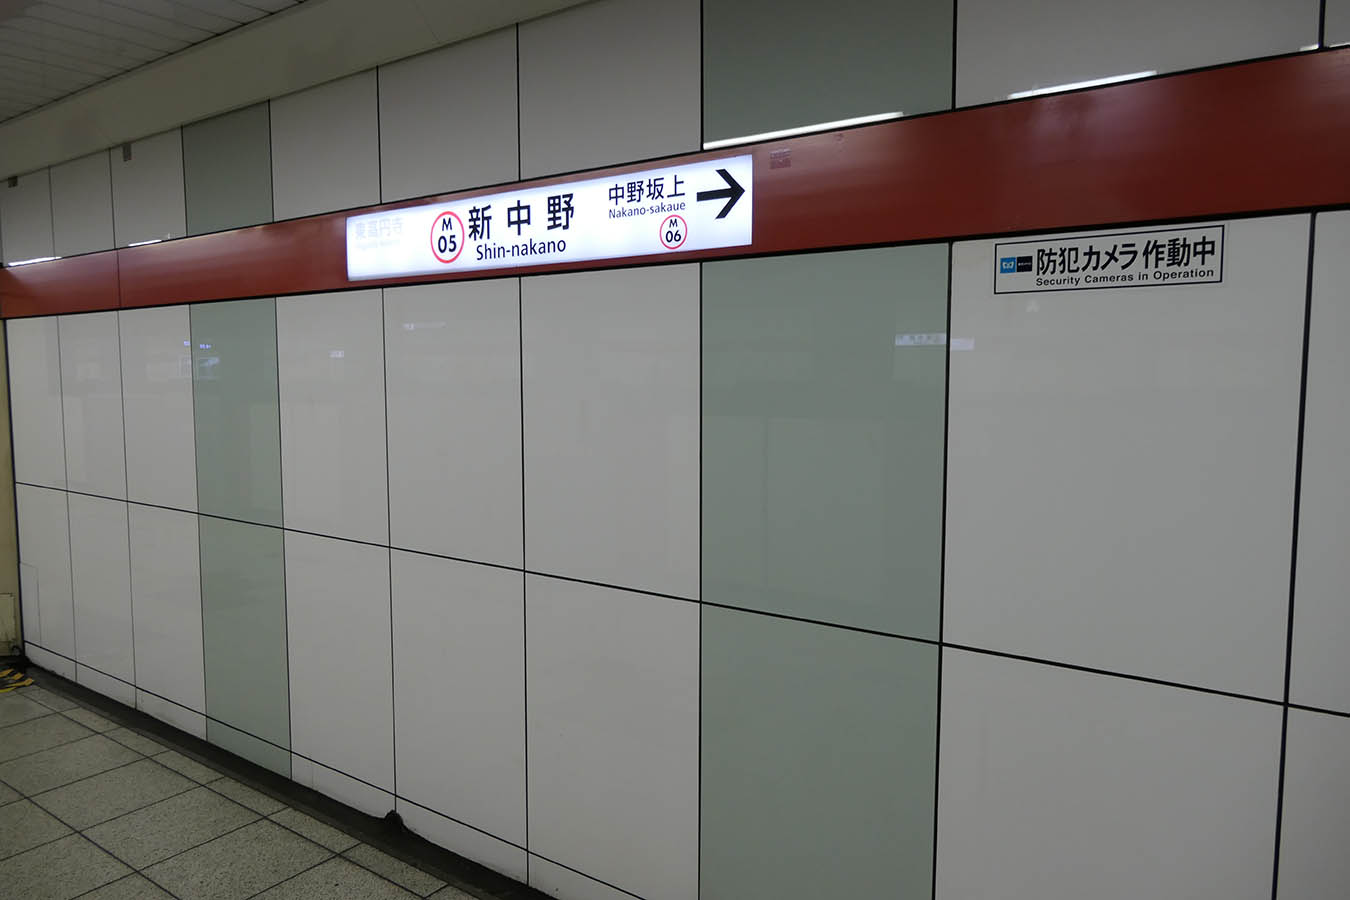 M05_photo01.jpg